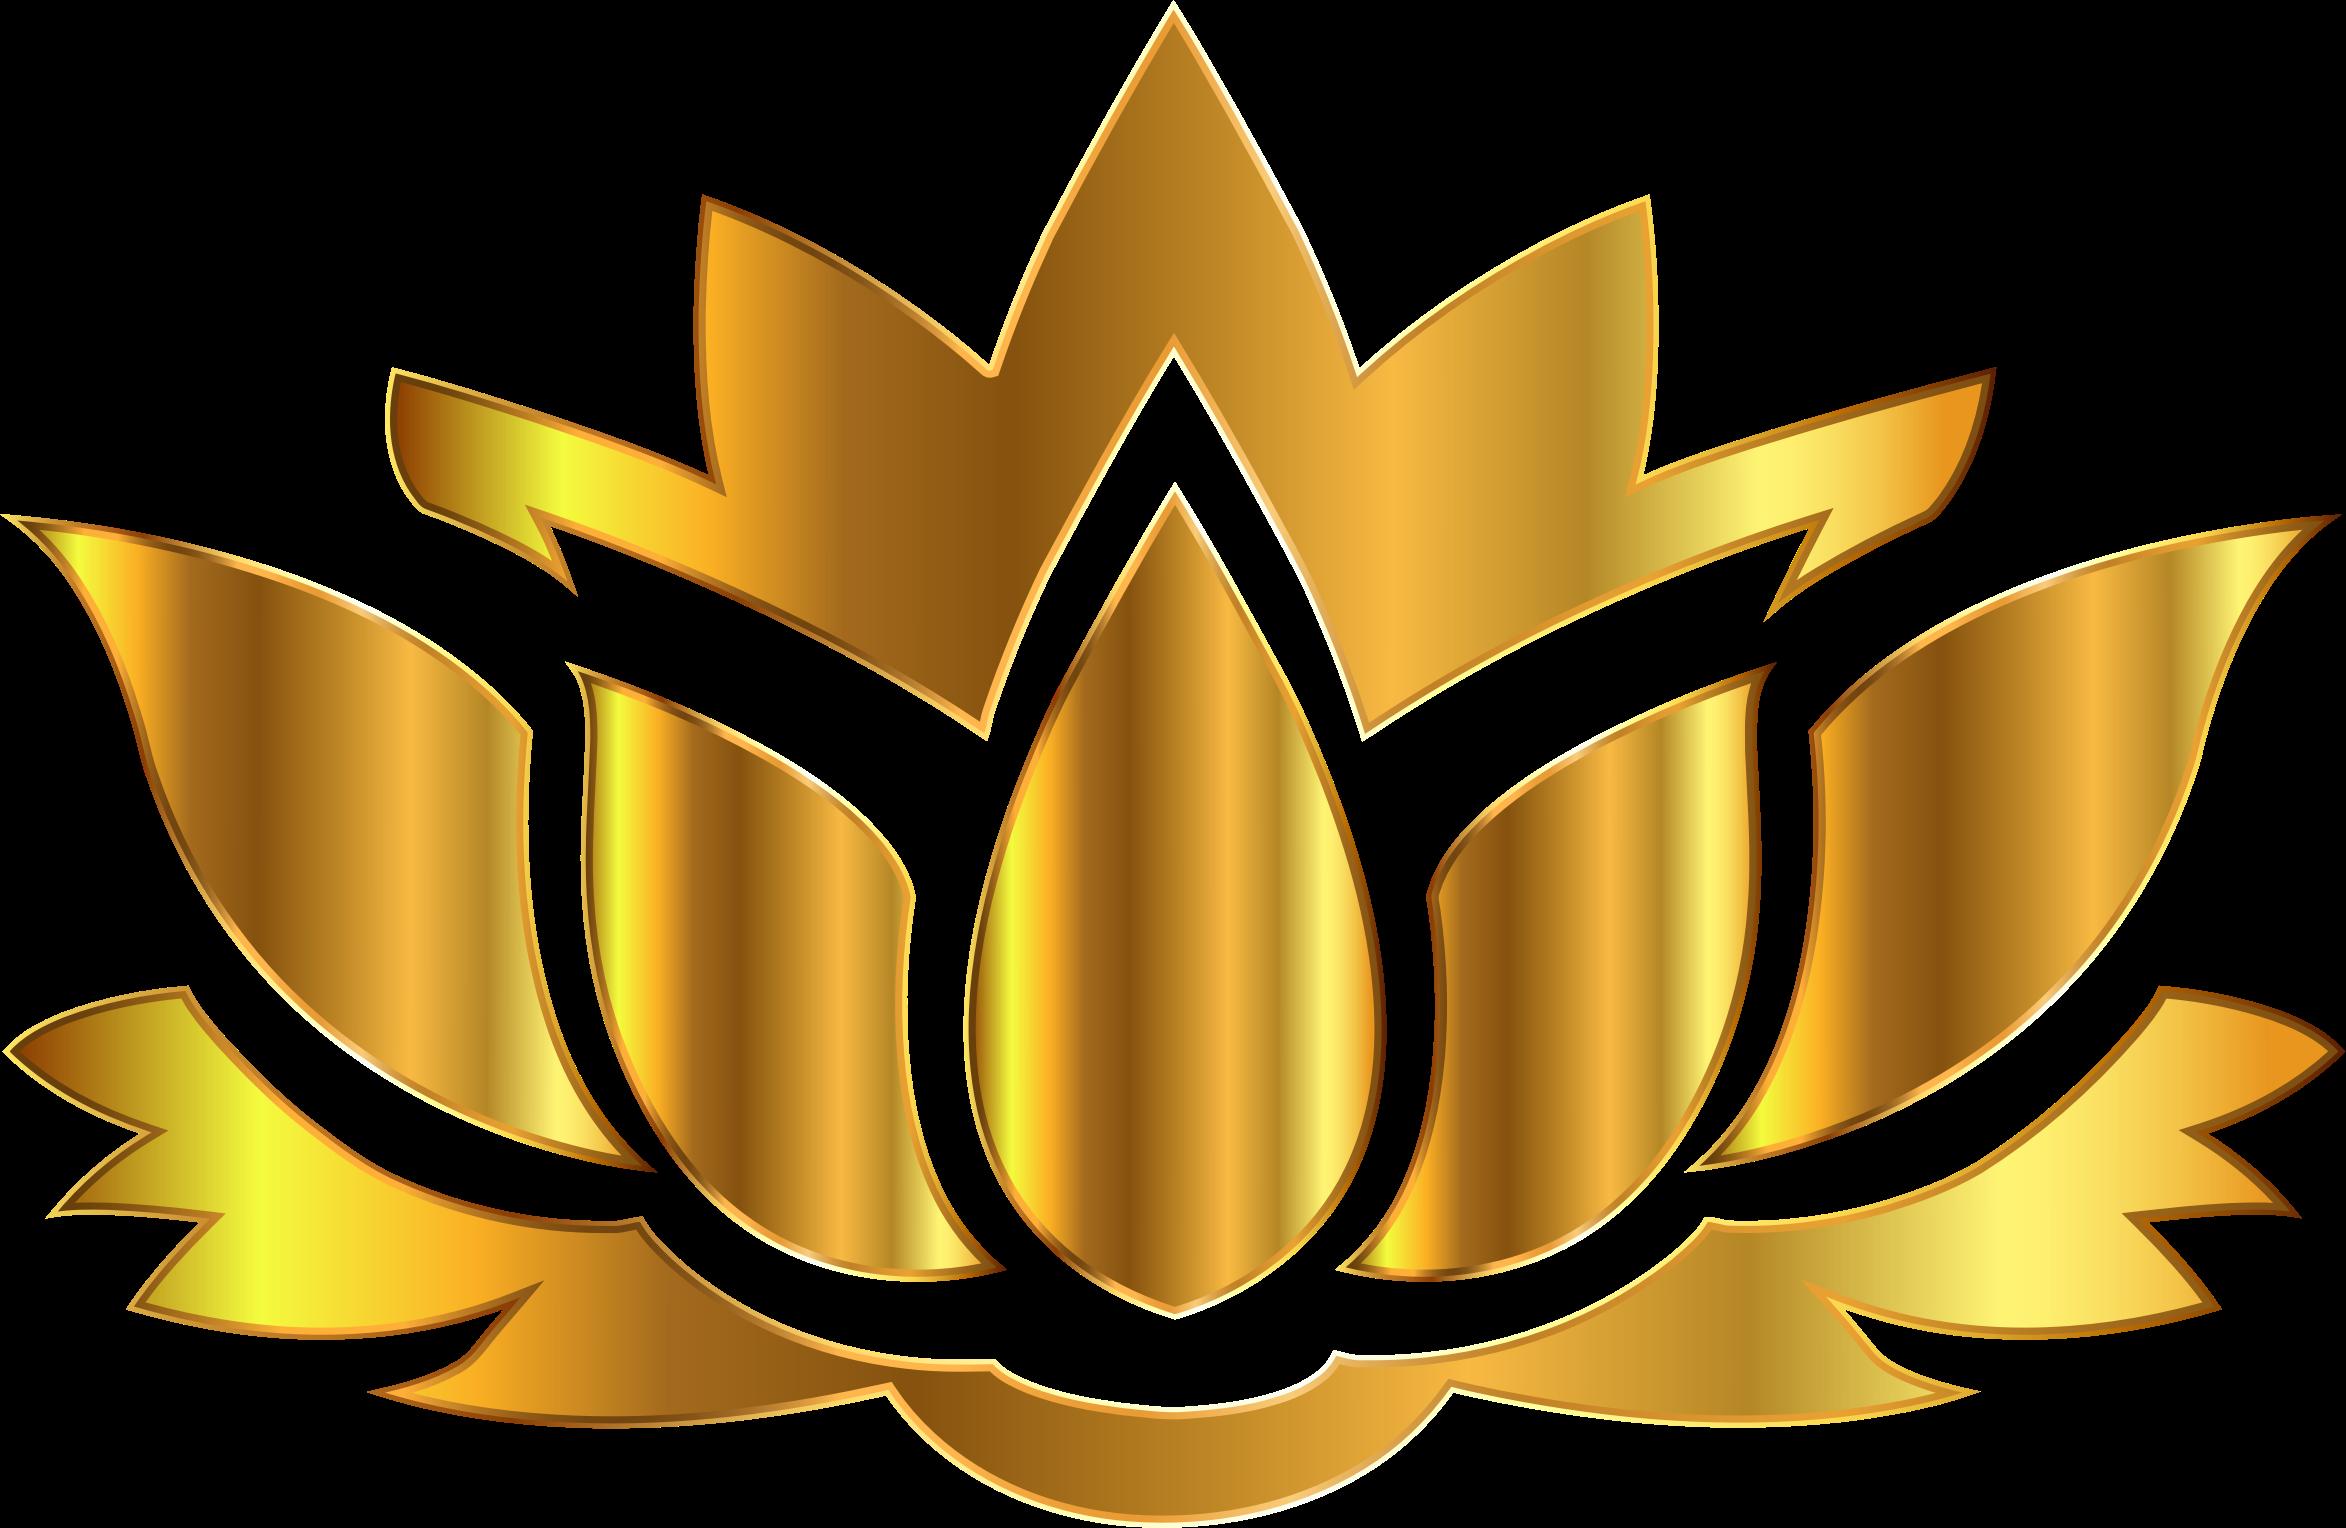 Free download transparent transparentpng. Lotus flower graphic png